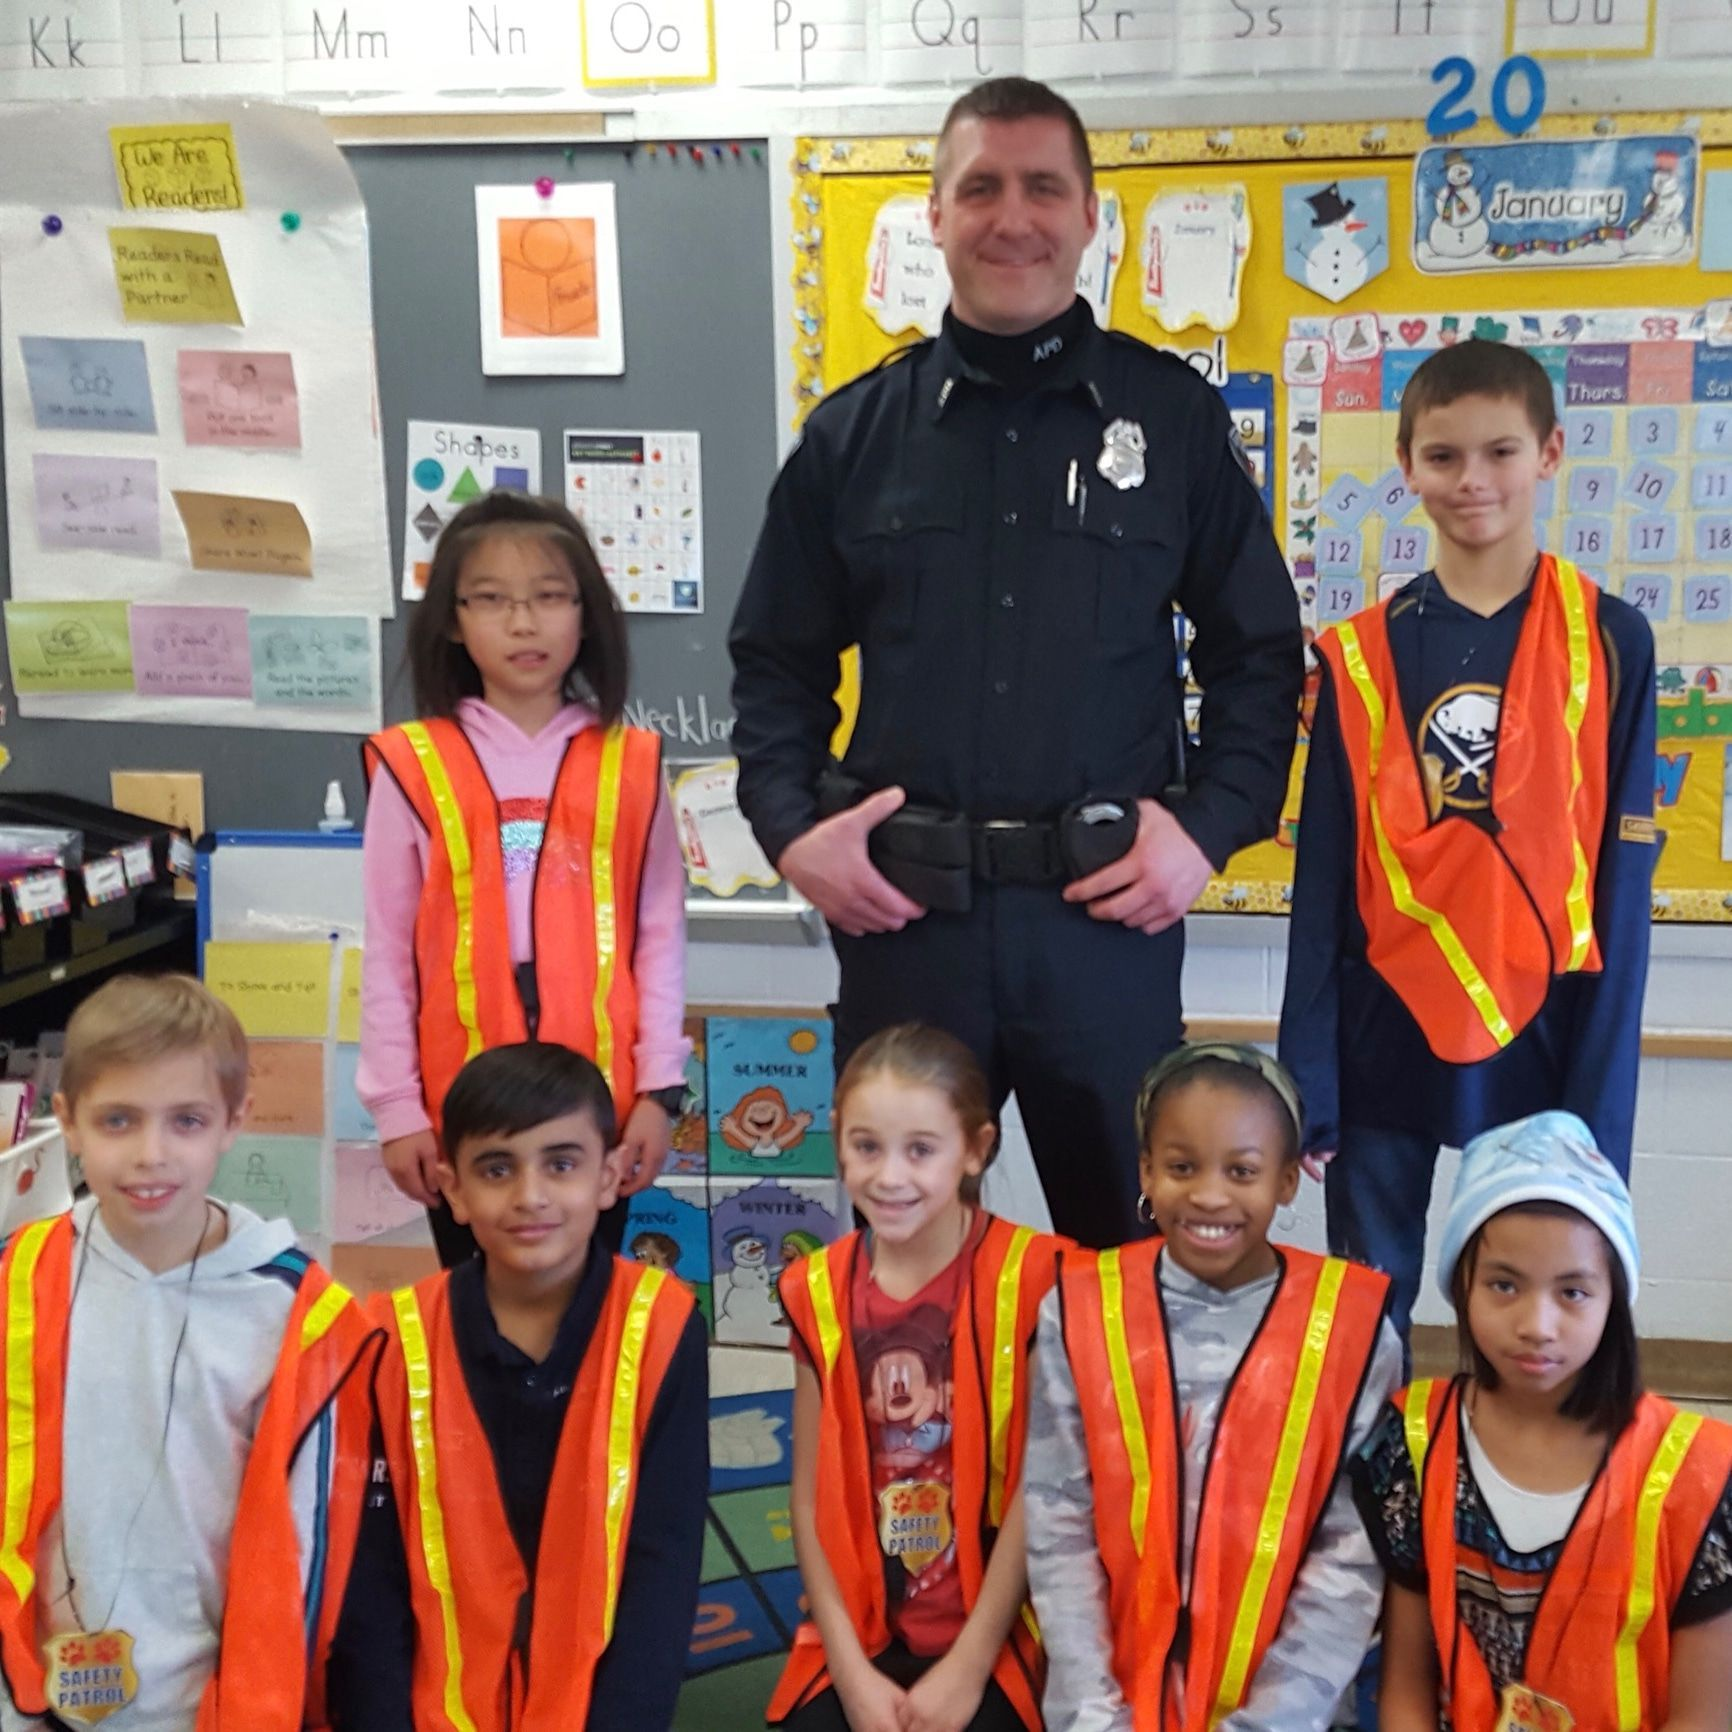 School Resource Officer Heim stopped by Heim Elementary